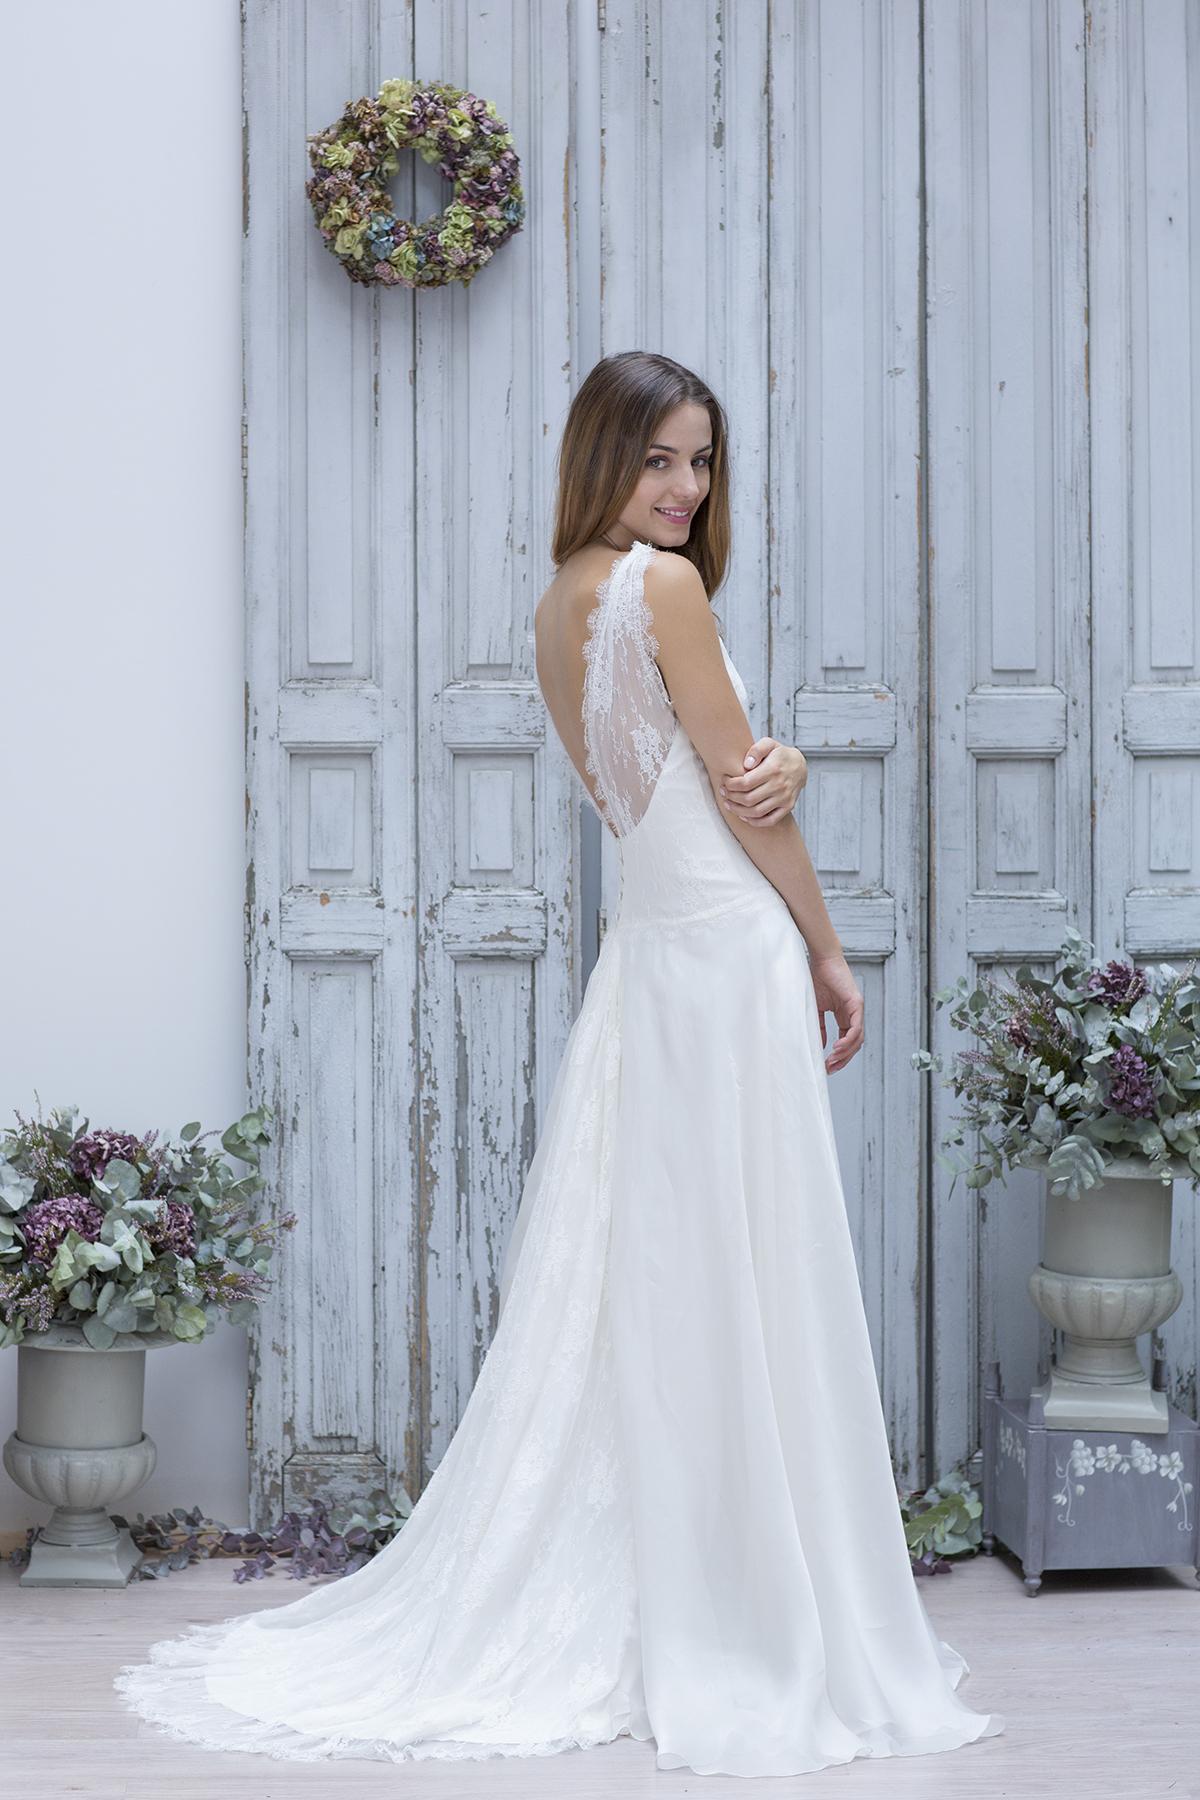 Prix d'une robe marie laporte